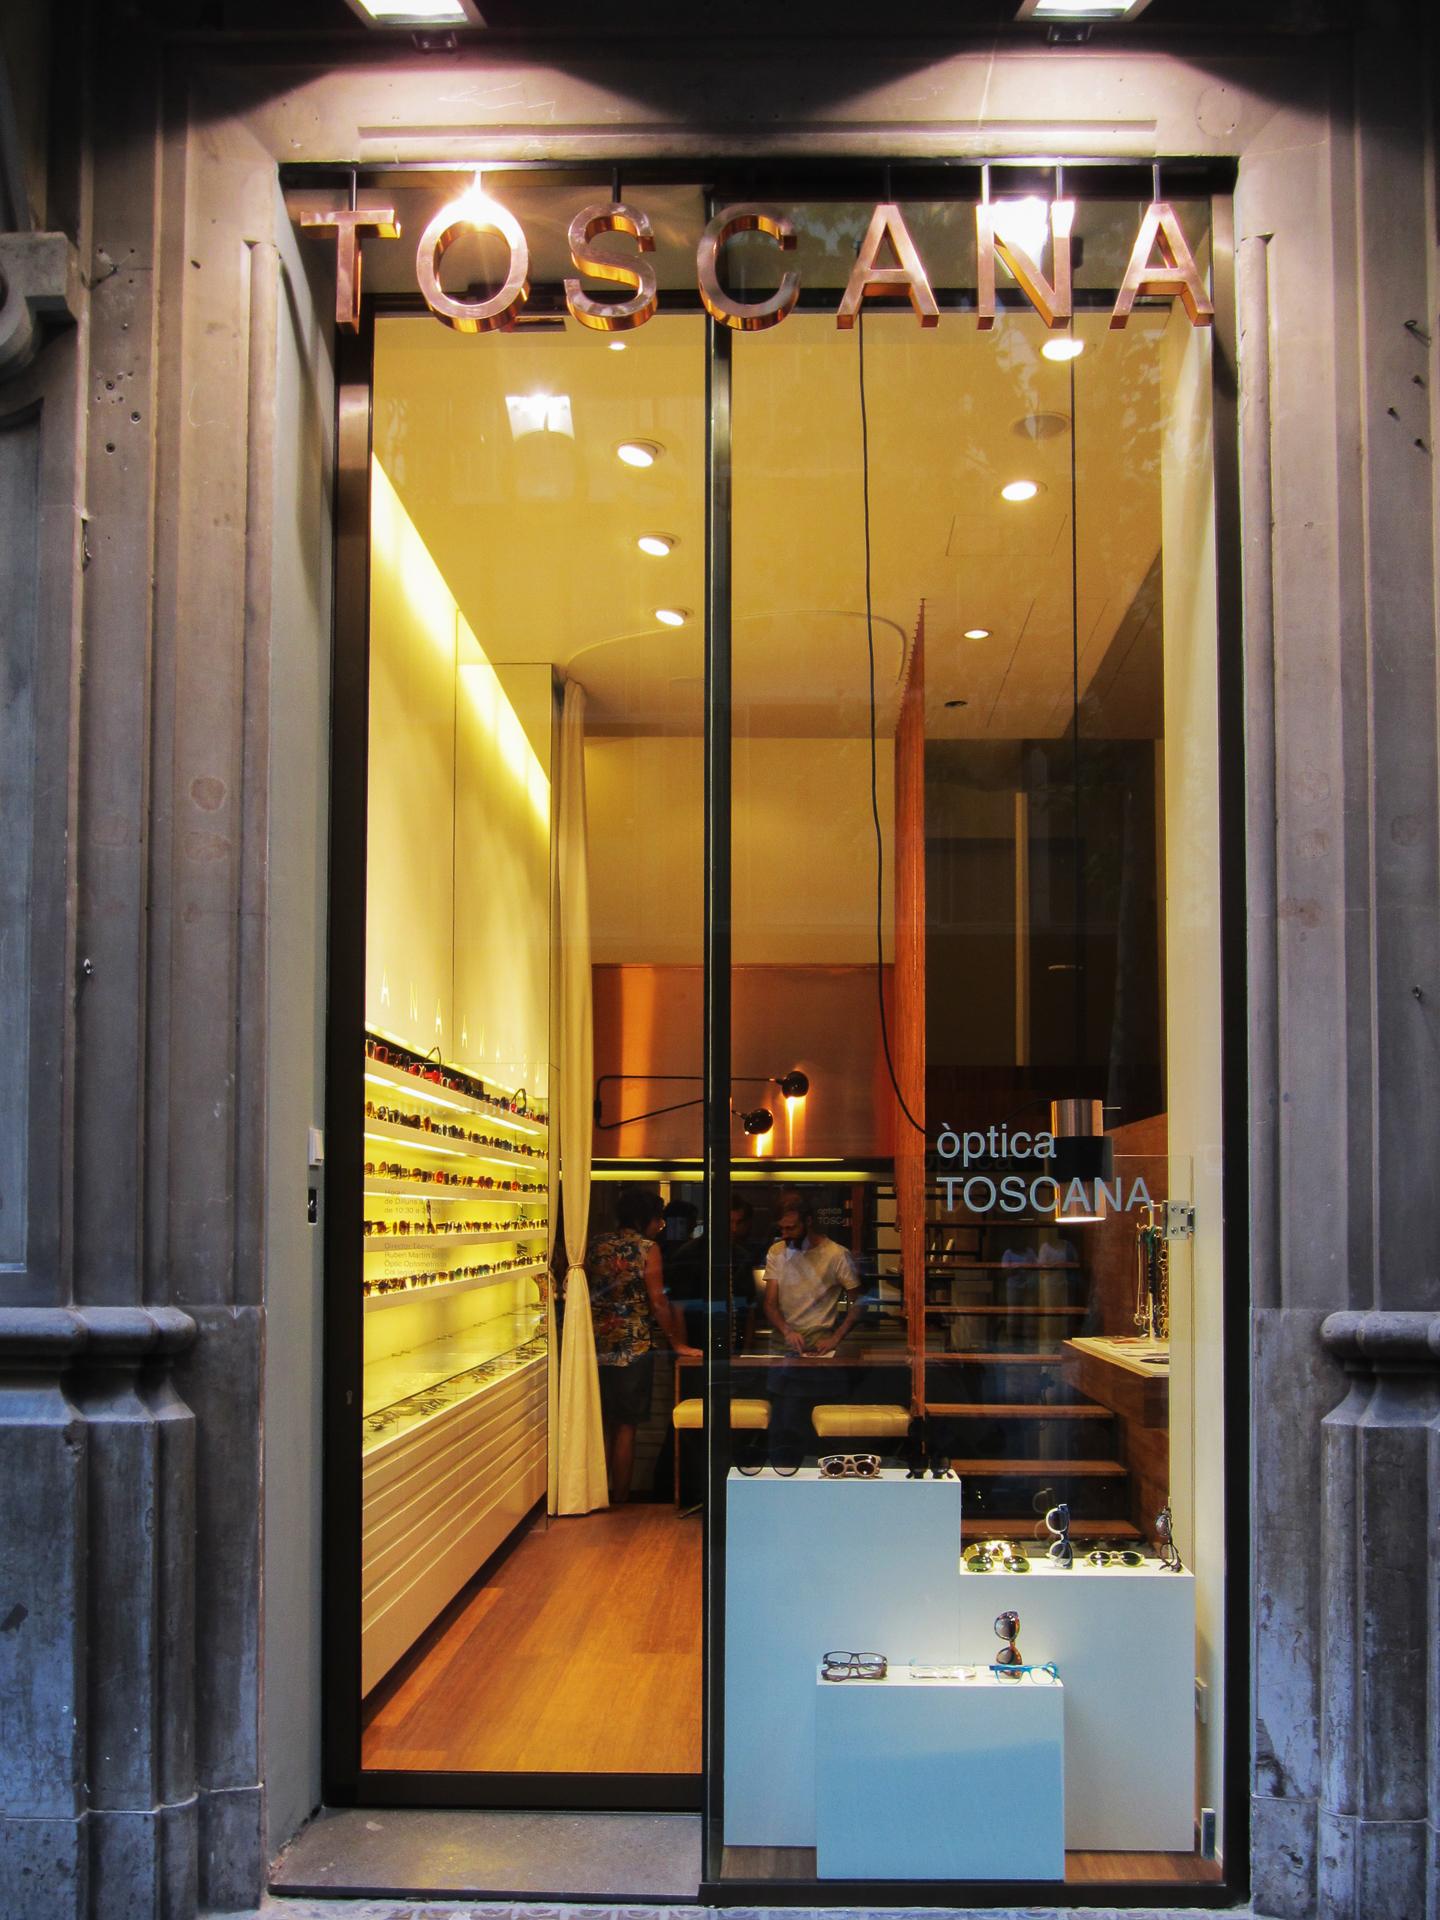 Toscana Barcelona